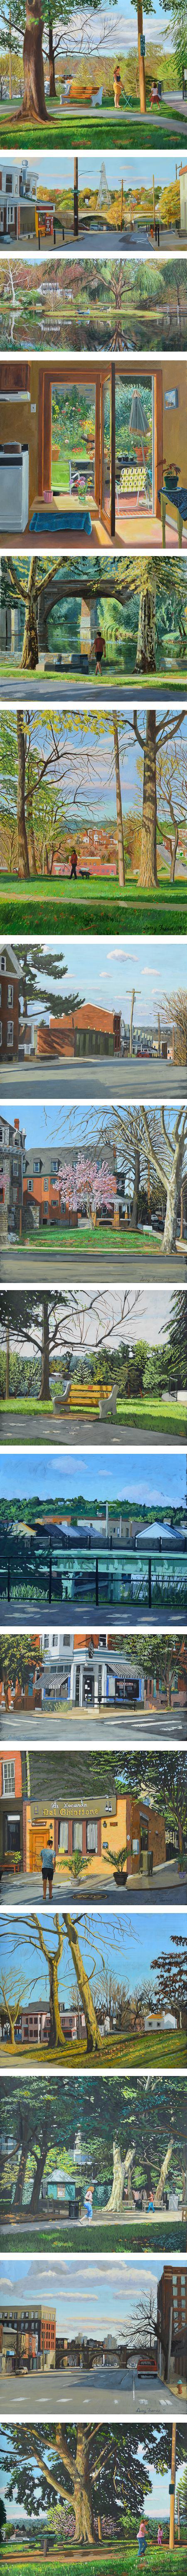 Larry Francis, Philadelphia paintings oil and gouache